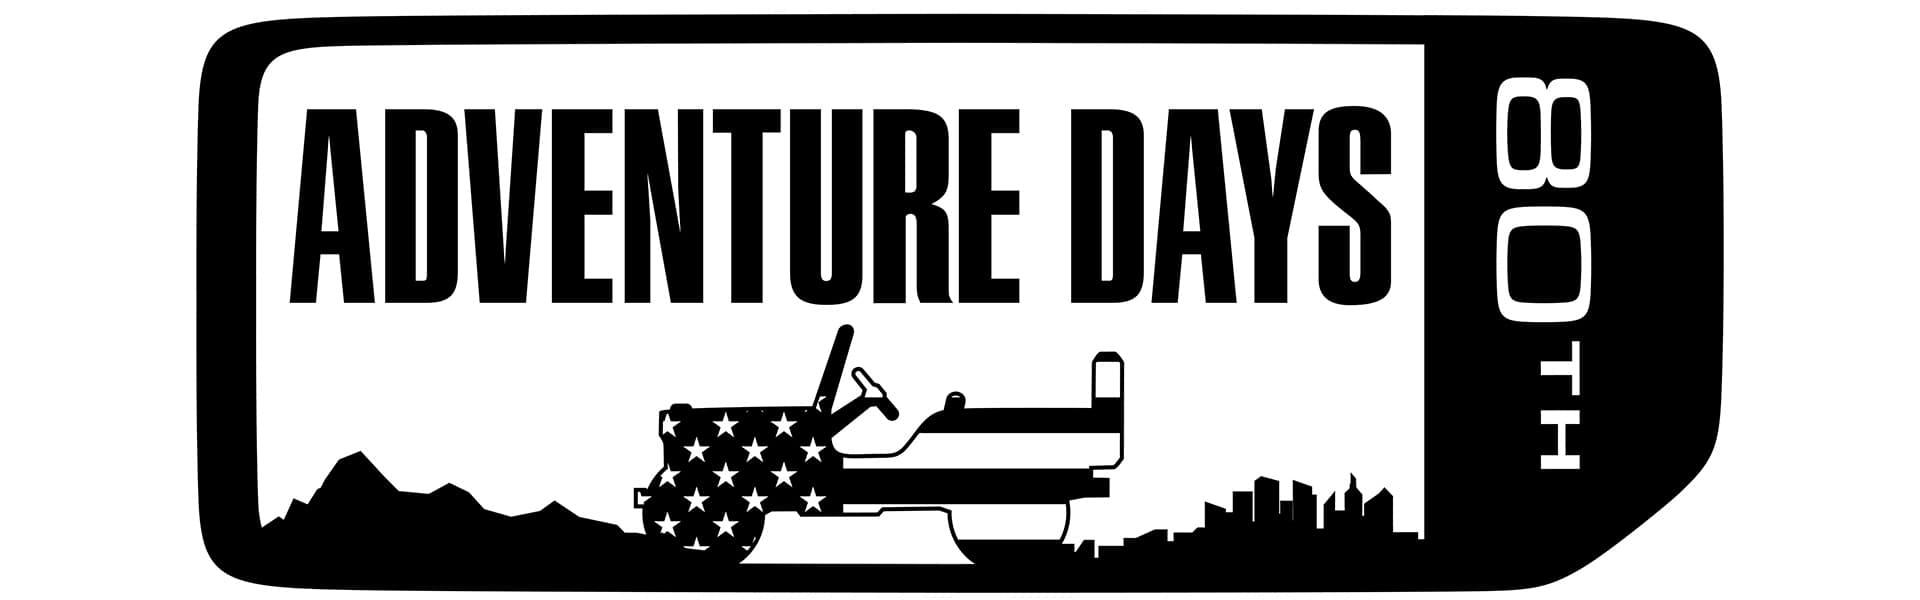 Jeep Adventure Days 80th